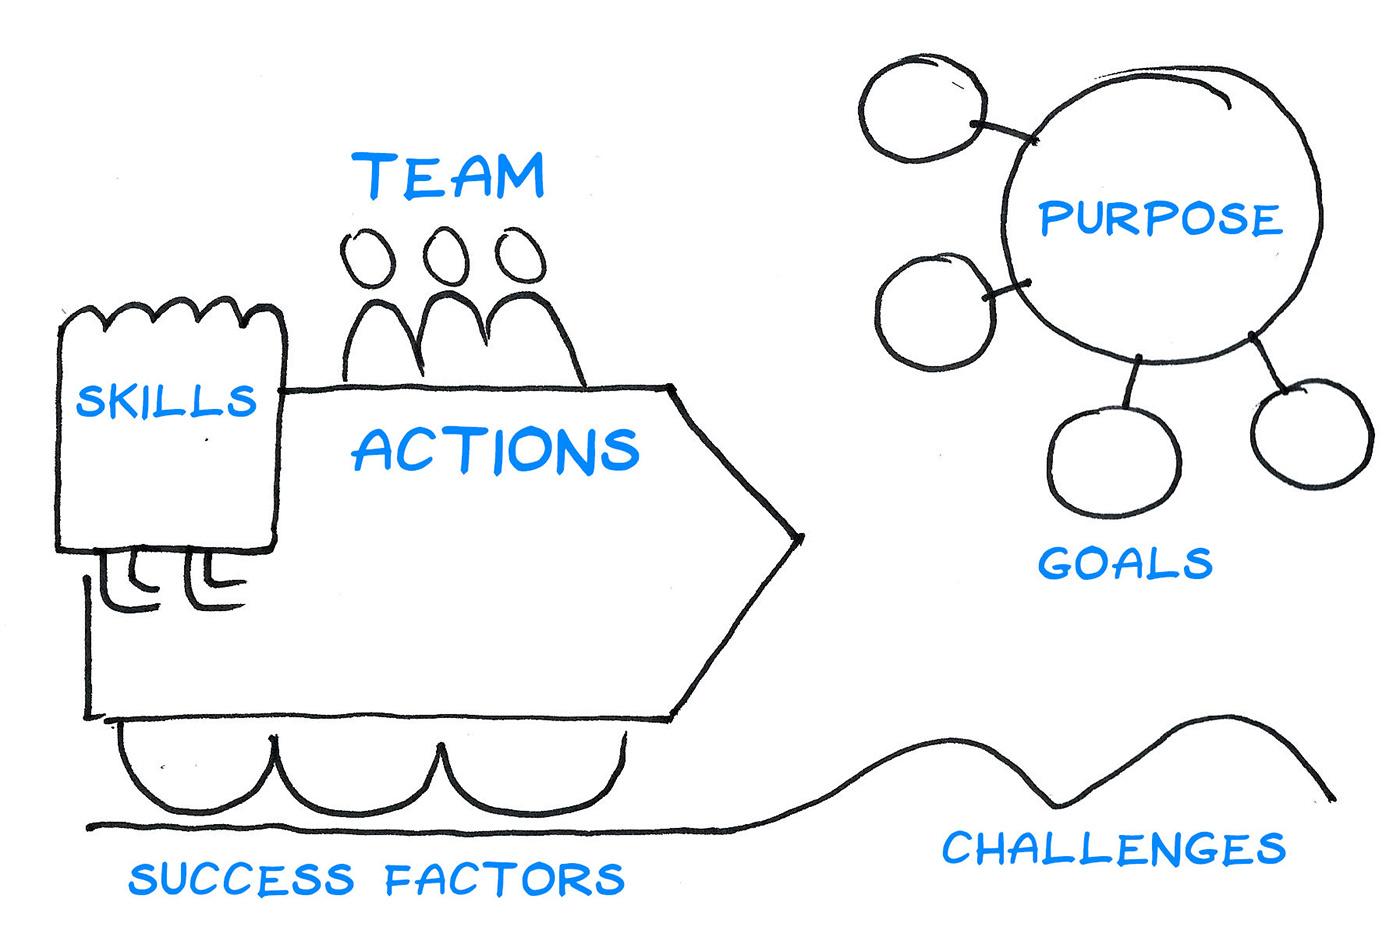 The Team Purpose map